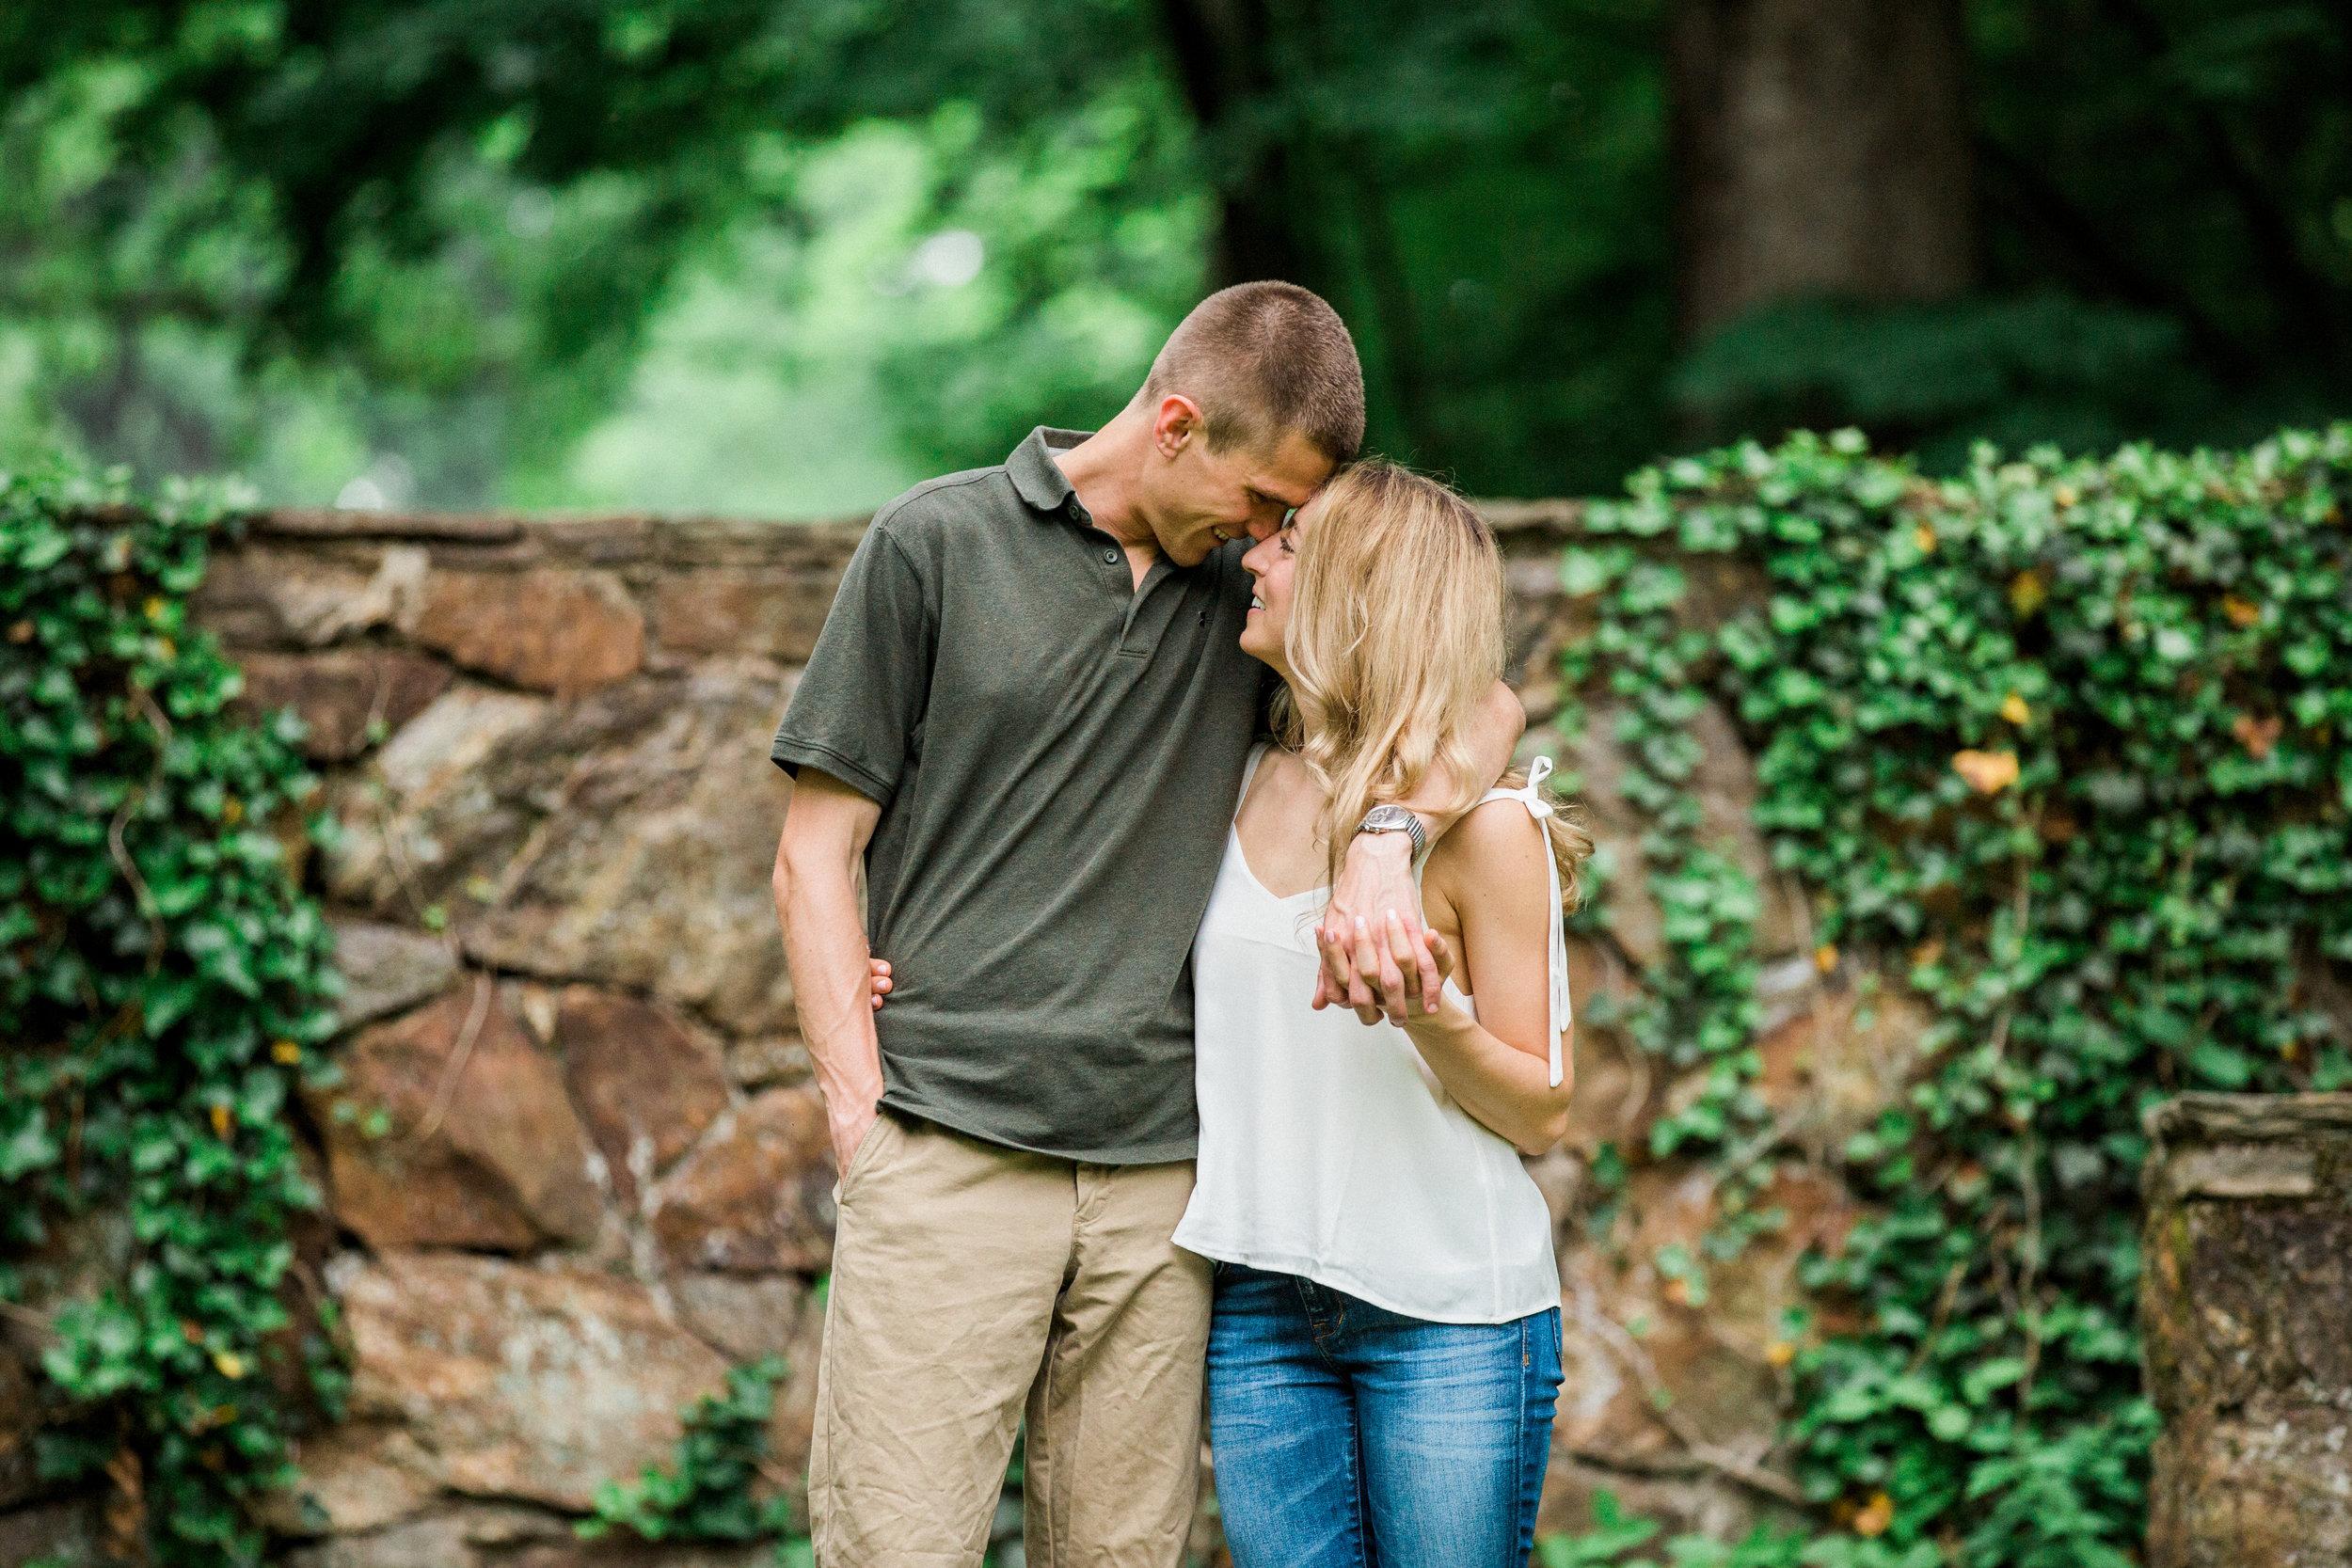 013-Wilmington-Delaware-Summer-Garden-Engagement-Emily-Andrew.jpg